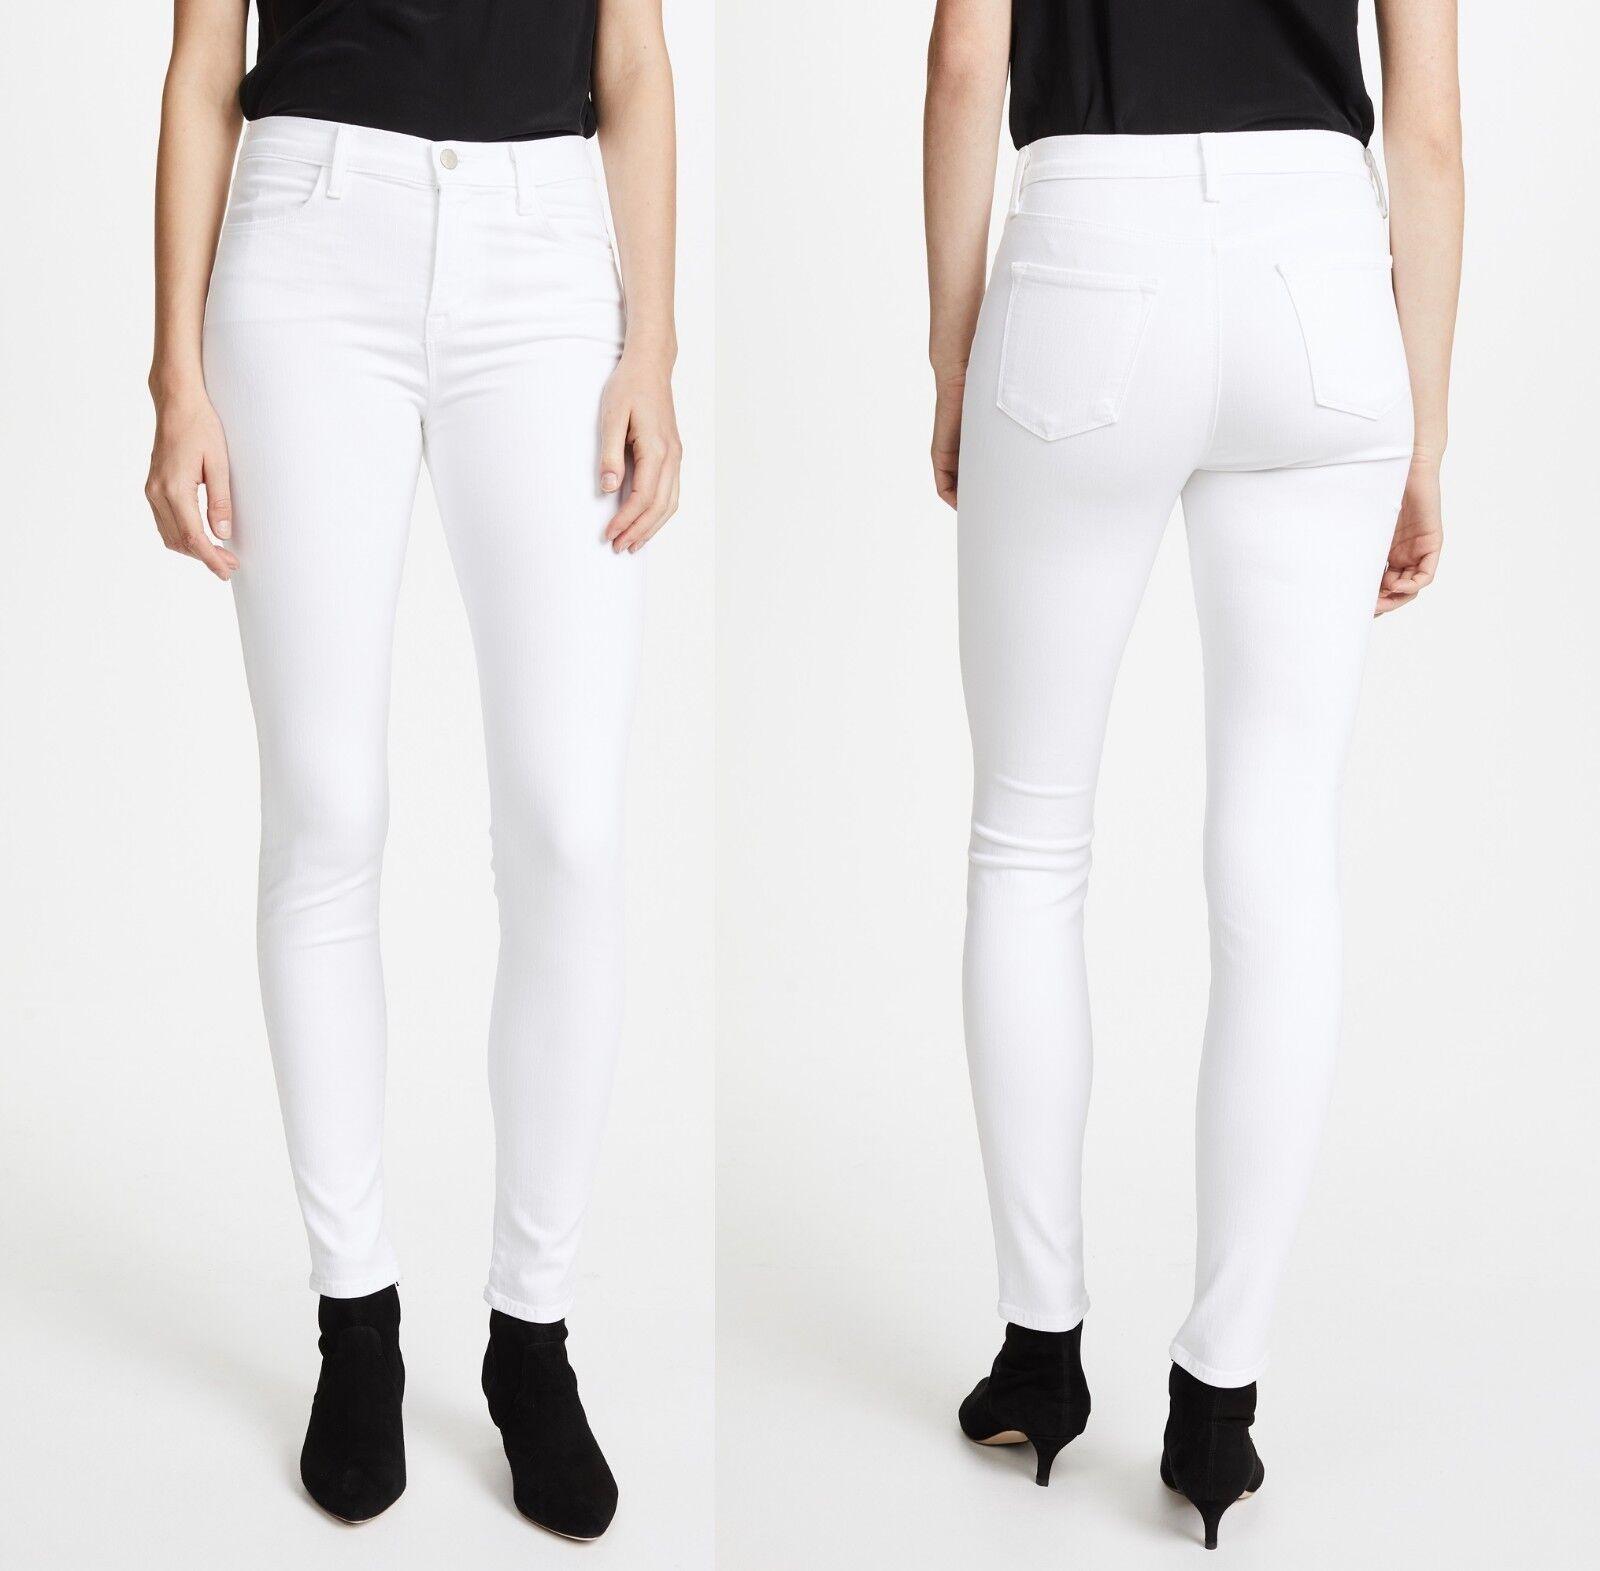 NEW J BRAND WOMEN JEANS MARIA HIGH-RISE SUPER SKINNY STRETCHY WHITE PANTS